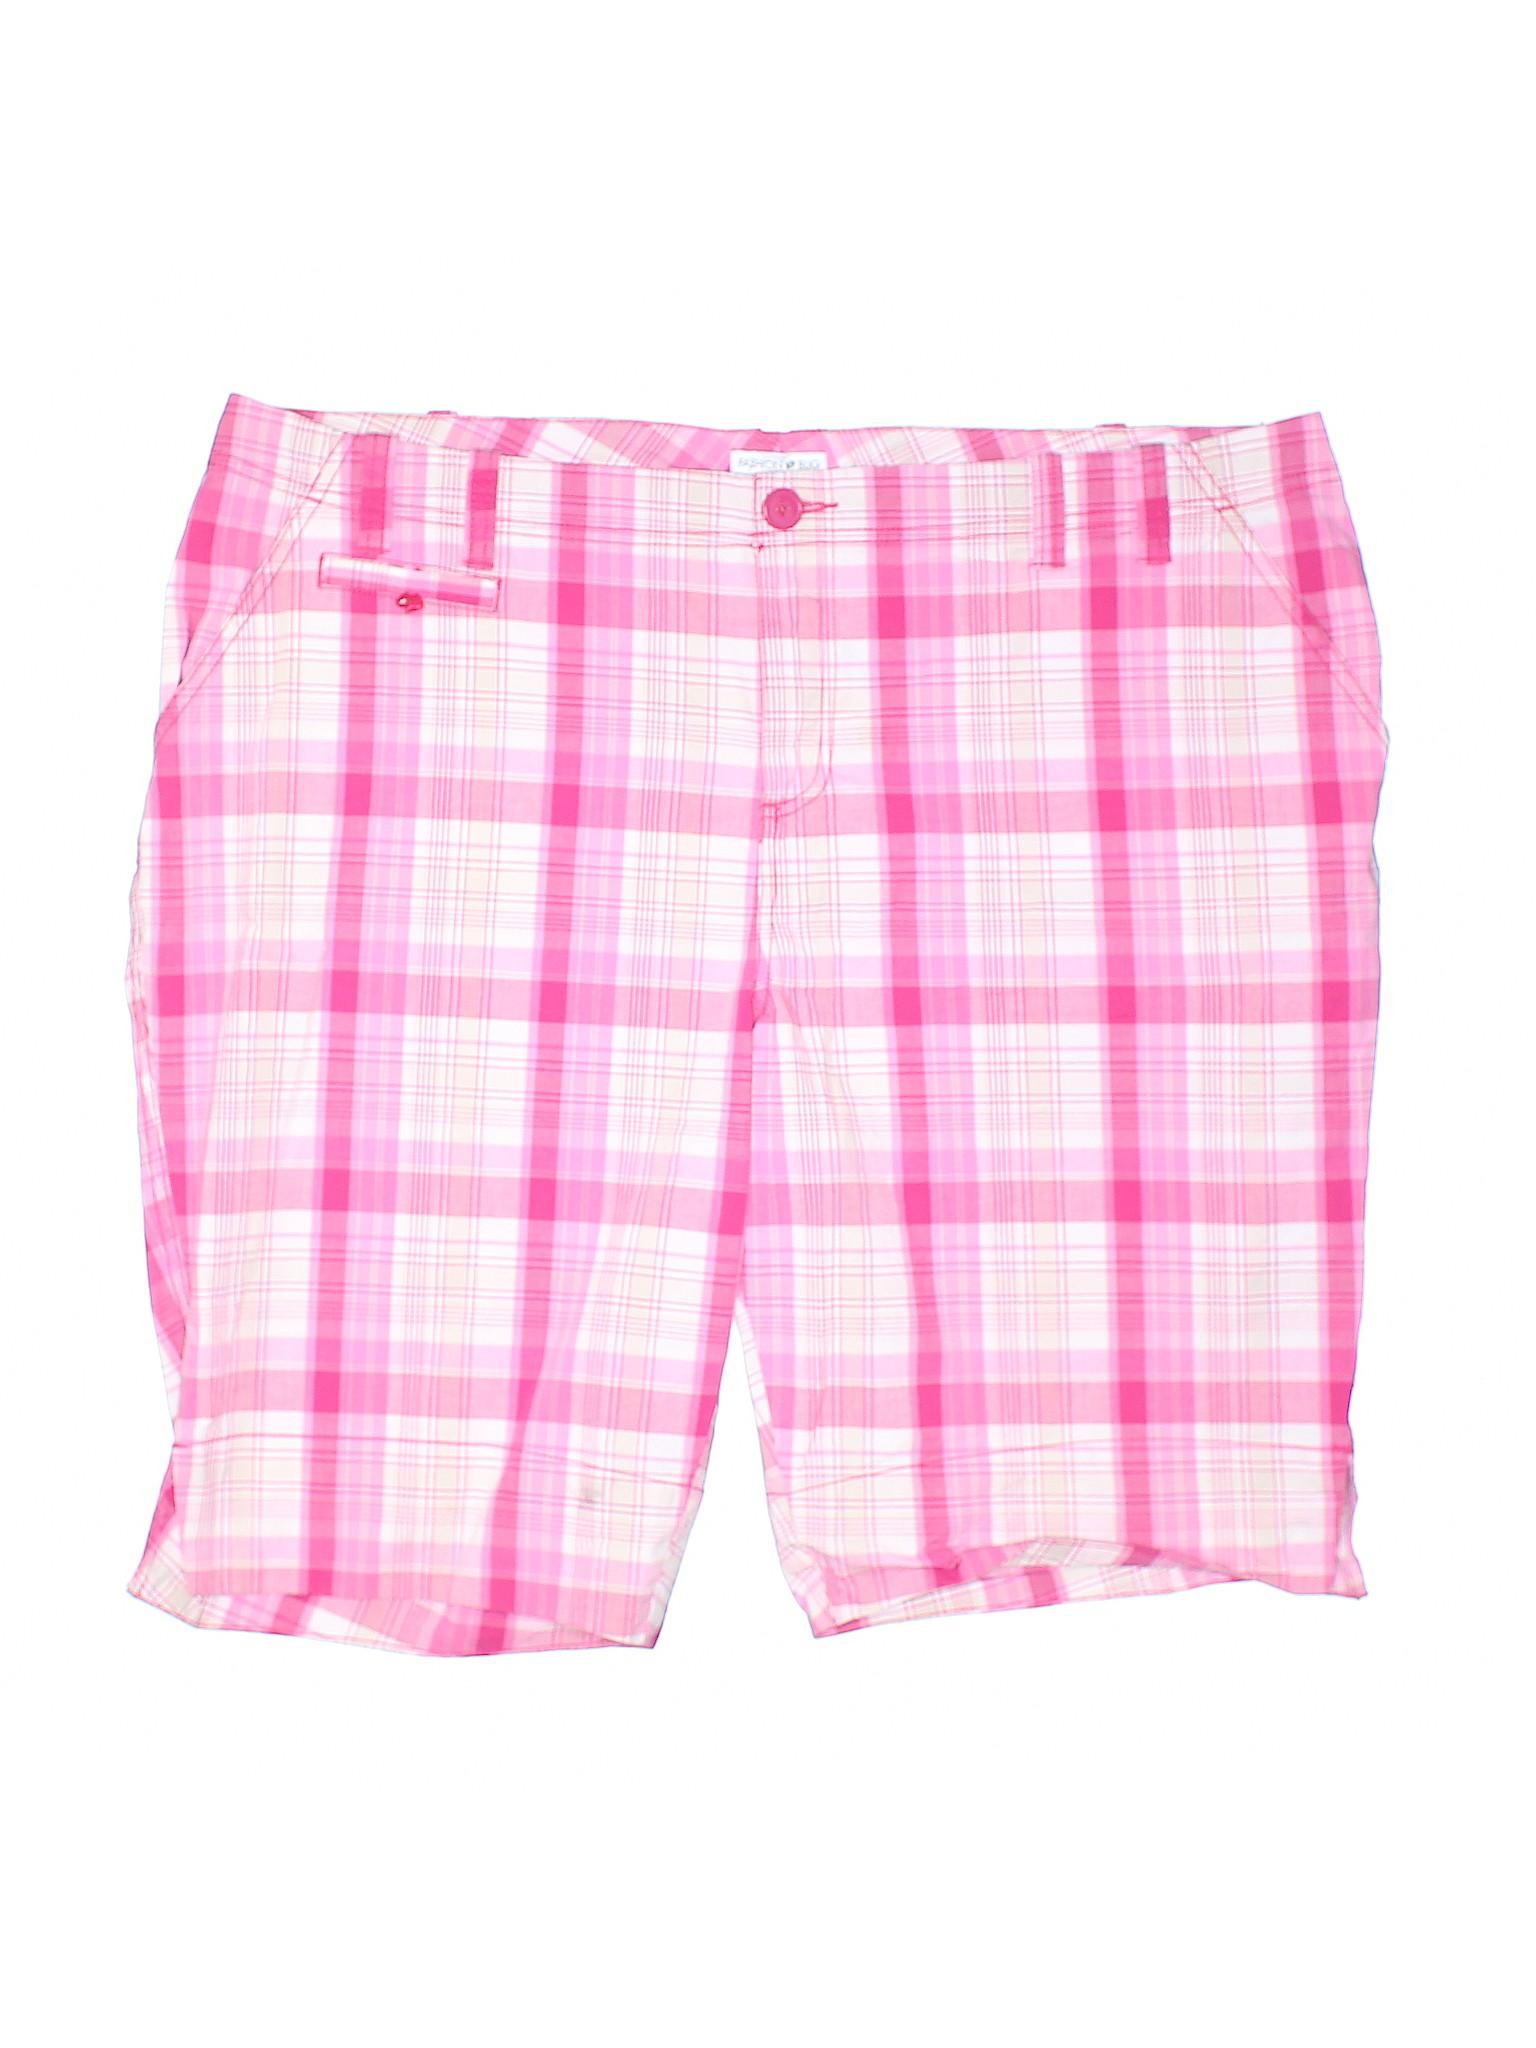 Boutique Shorts leisure Fashion Bug Khaki vHqvrAF